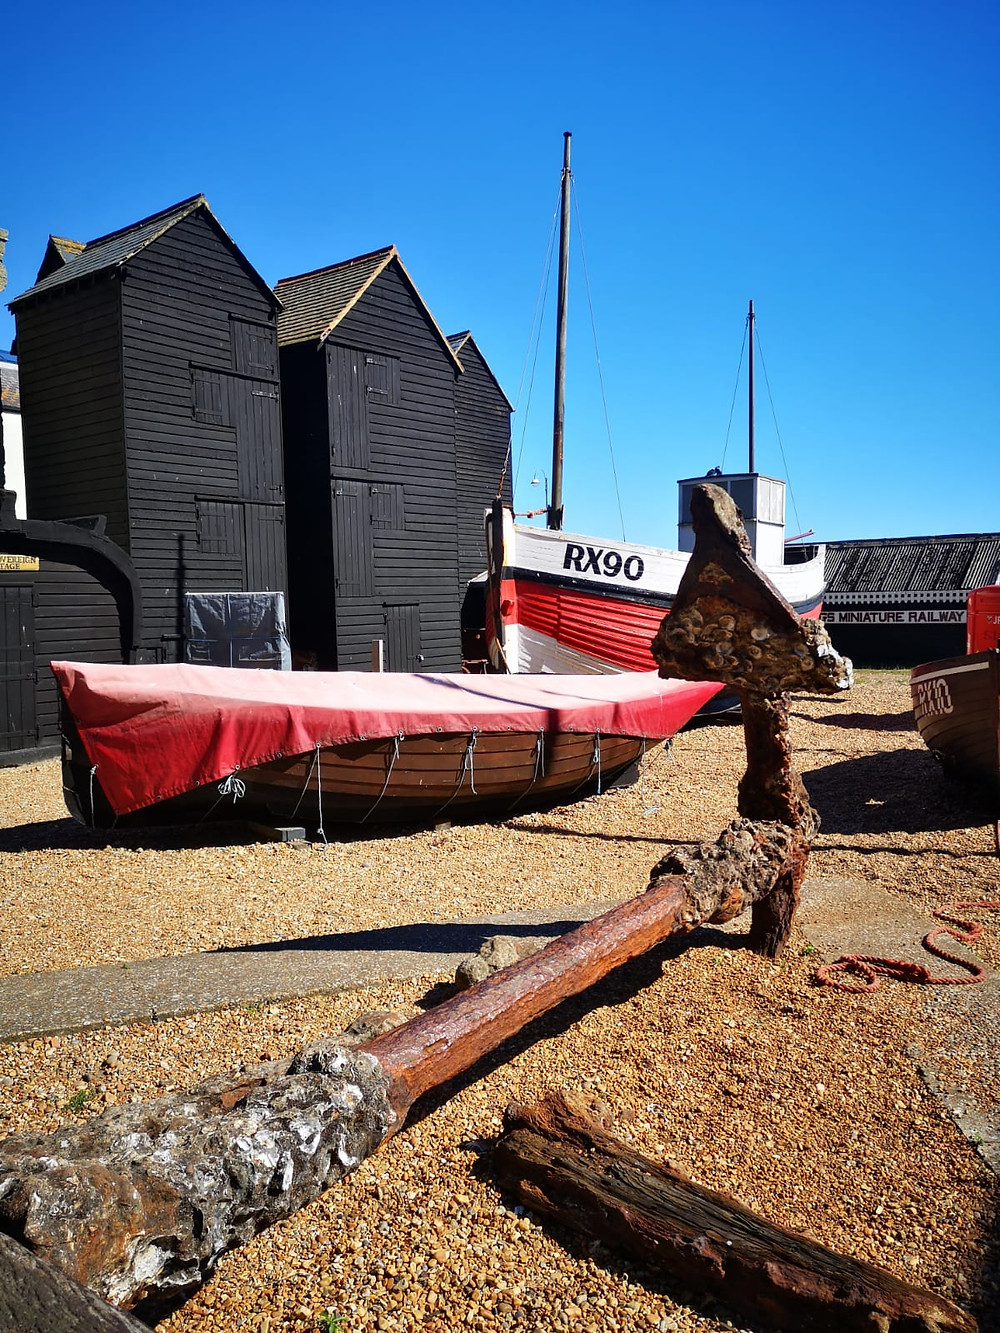 Hasting Fishing Net Sheds, Wooden Sheds